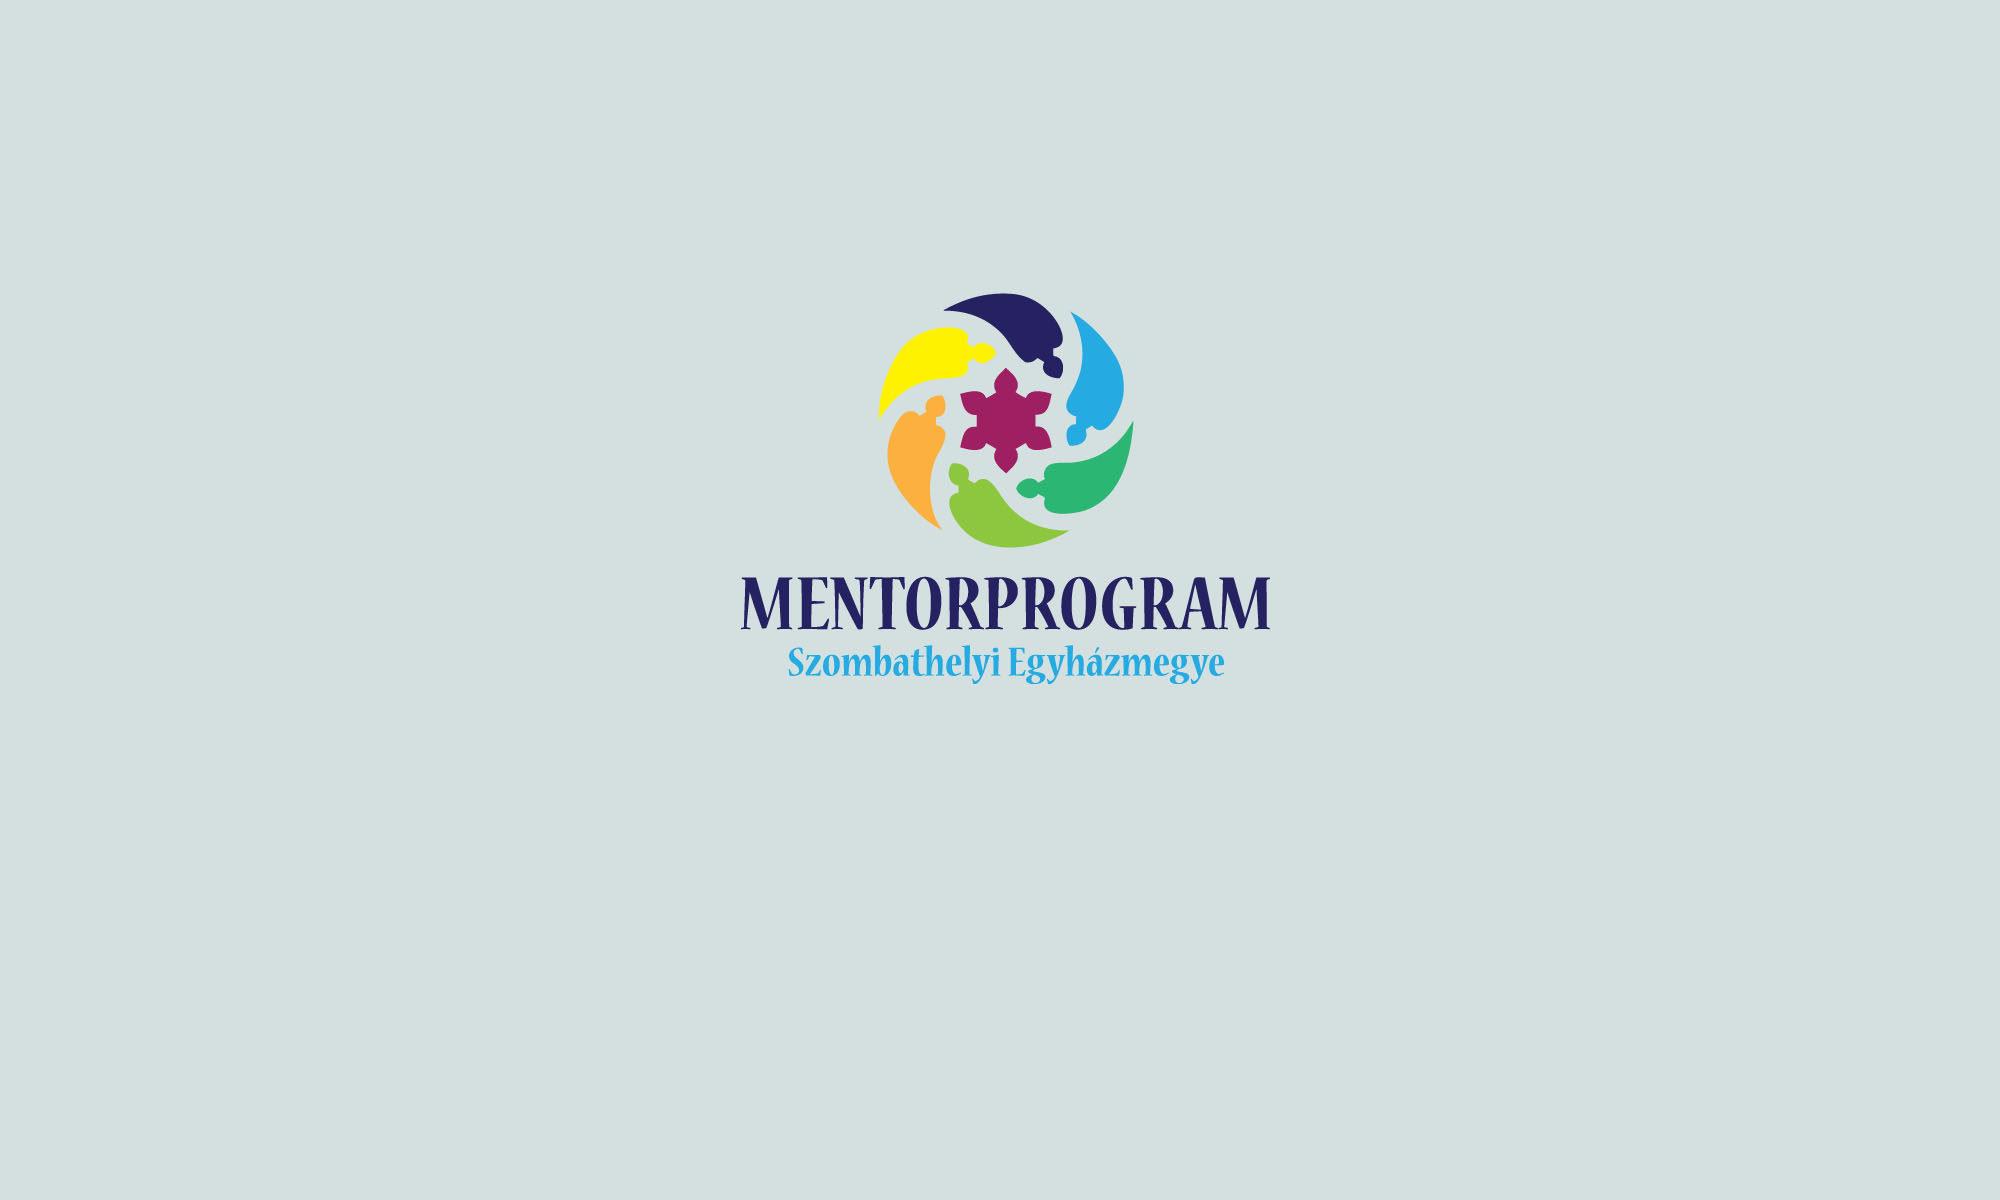 MENTORPROGRAM